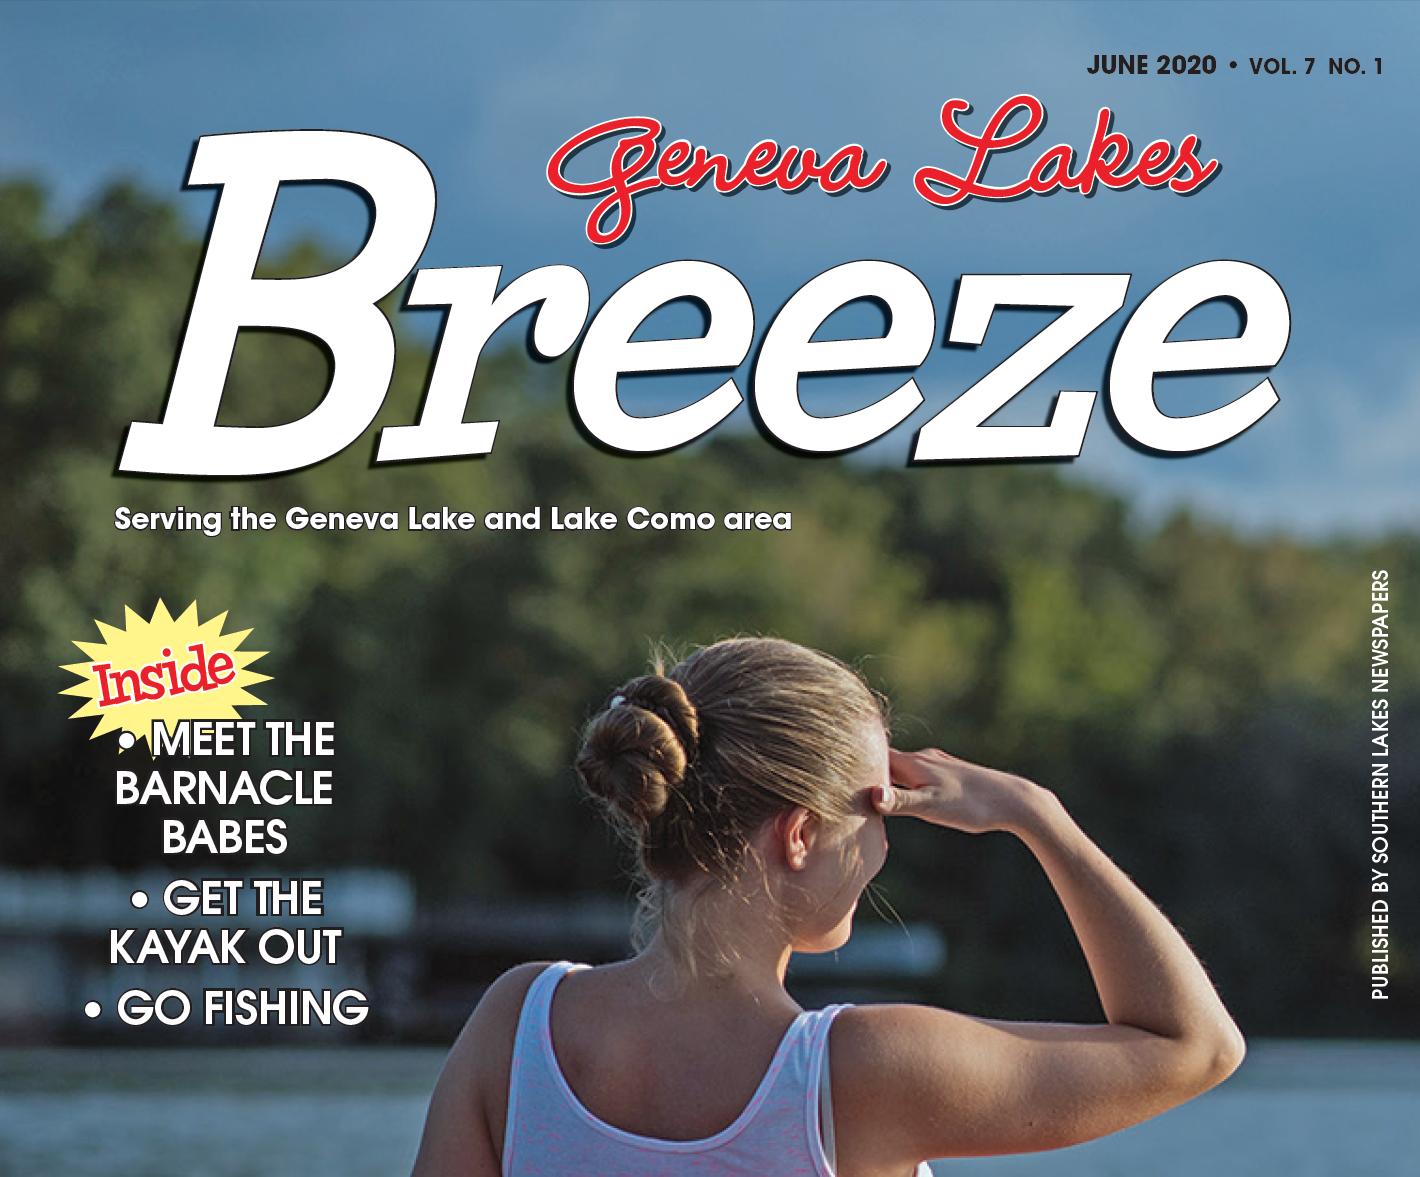 Geneva Lakes Breeze June 2020